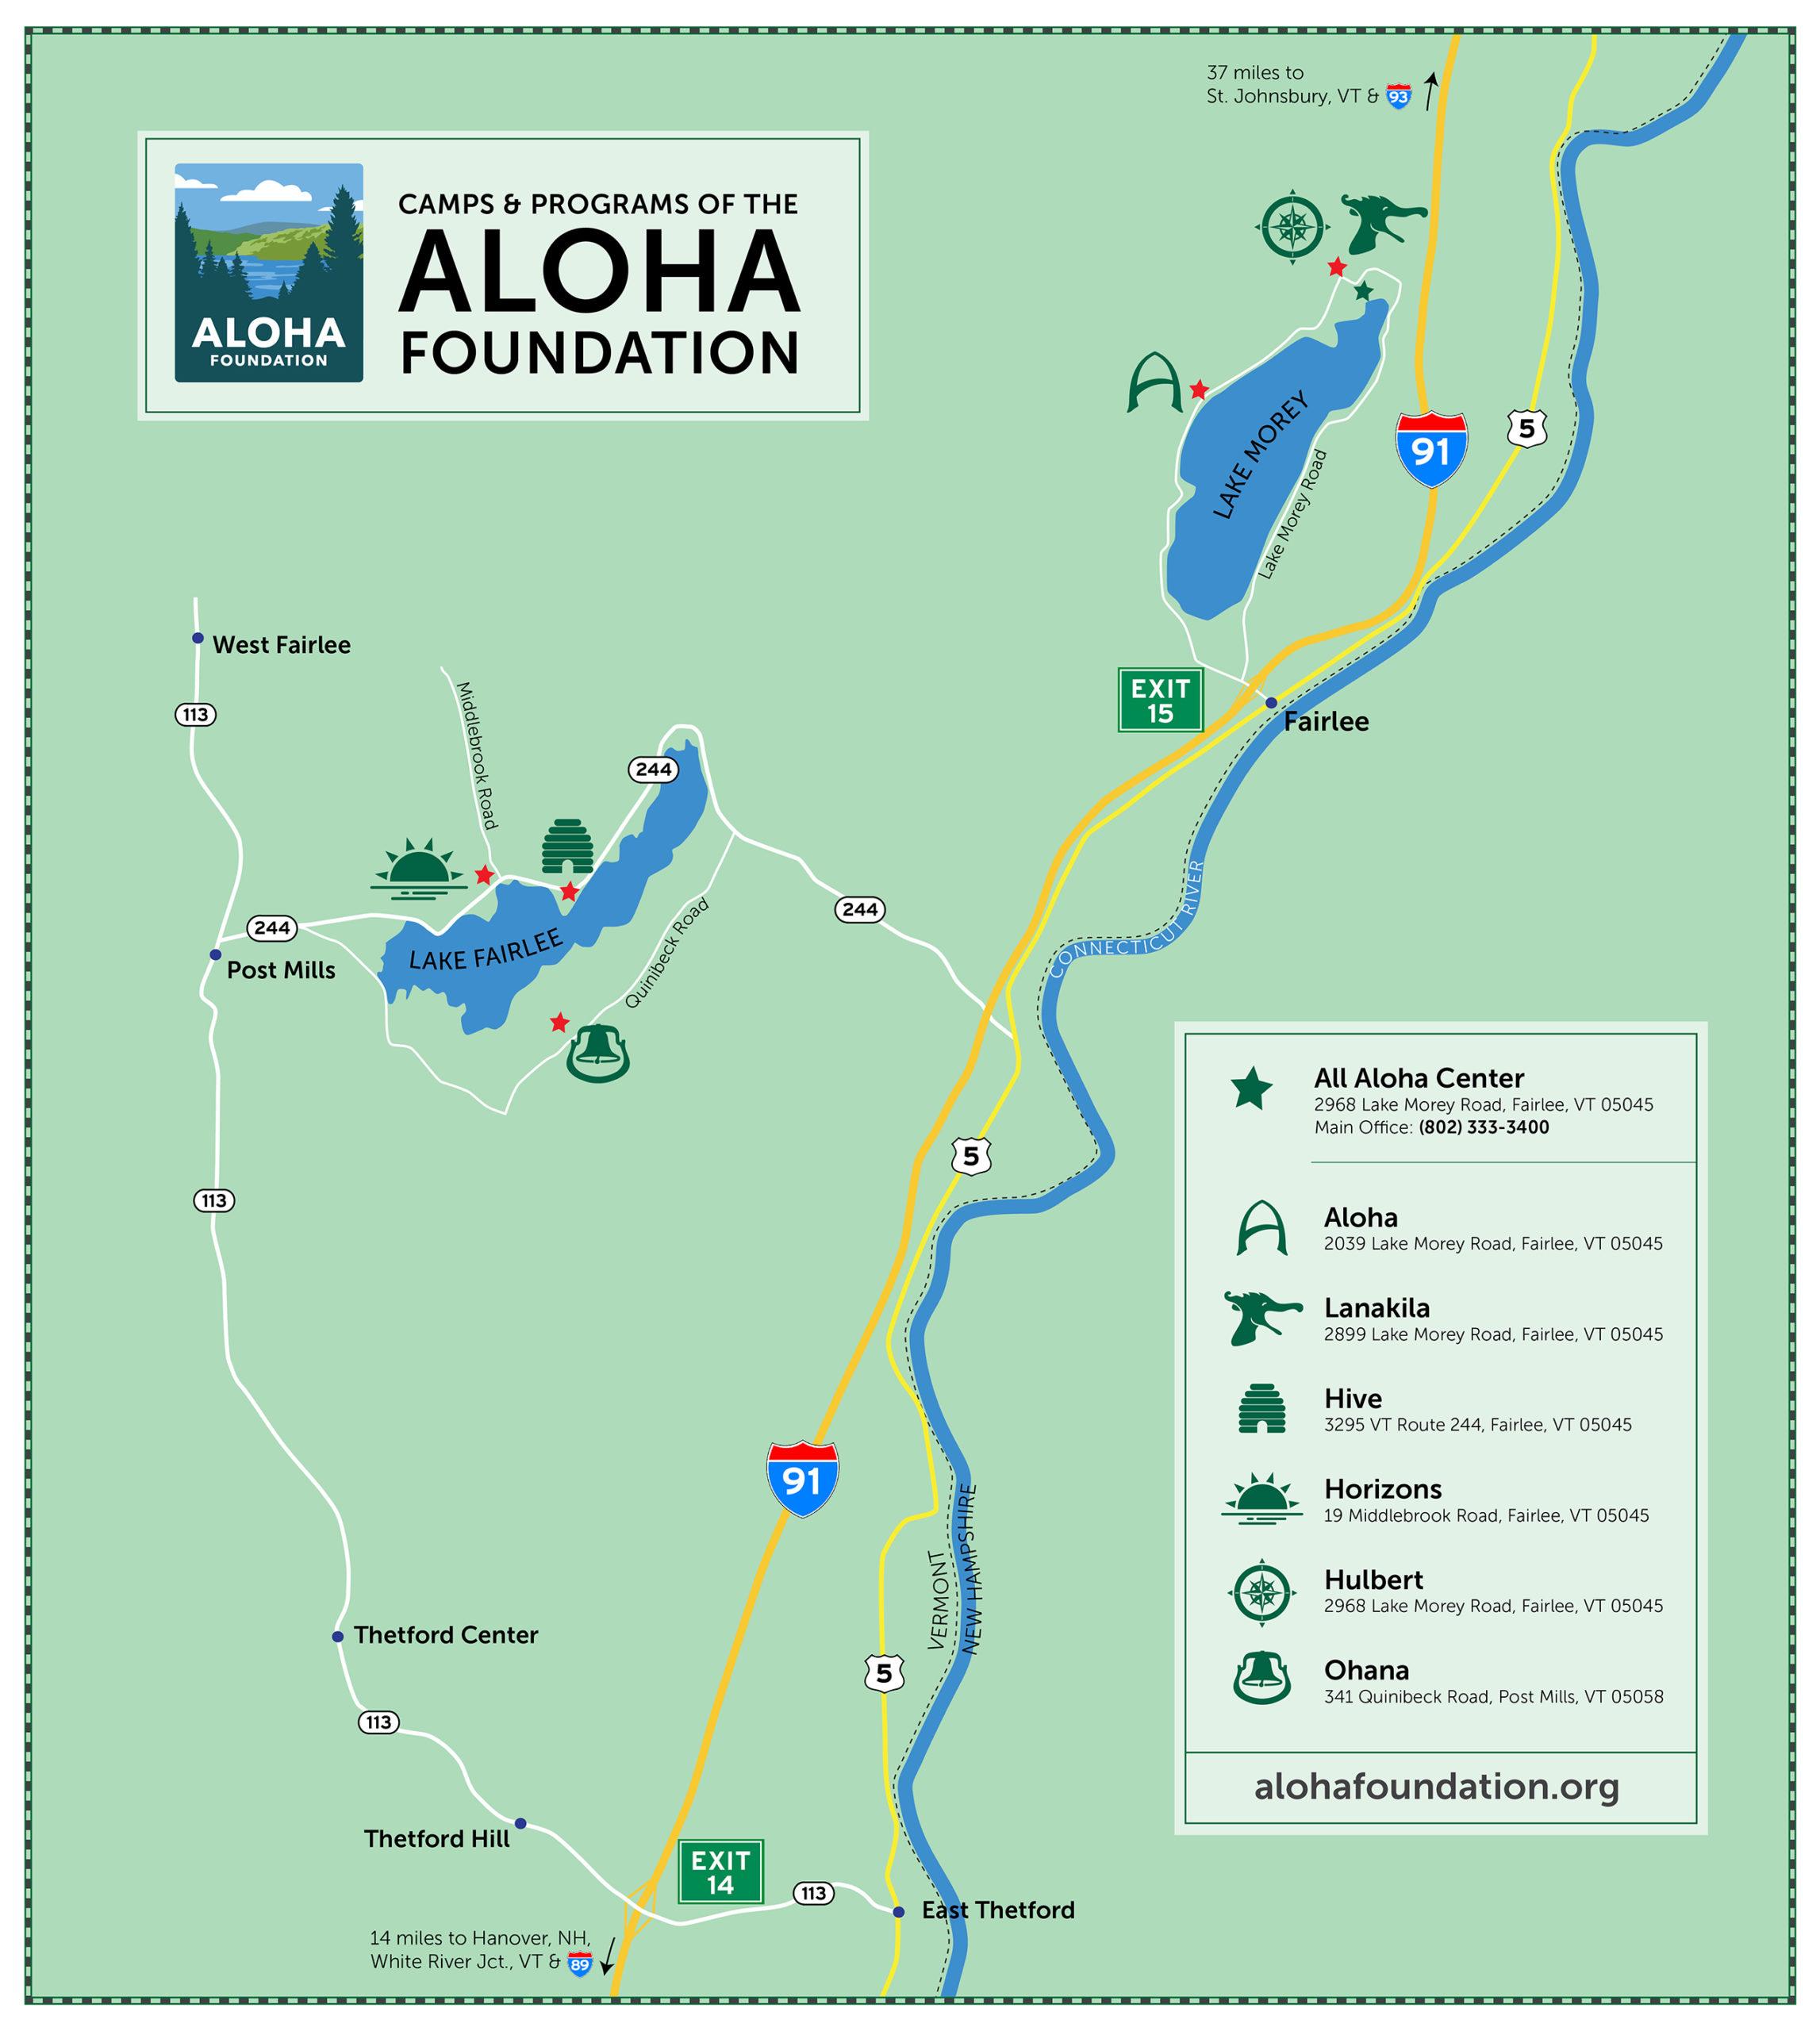 A map of the Aloha Foundation.